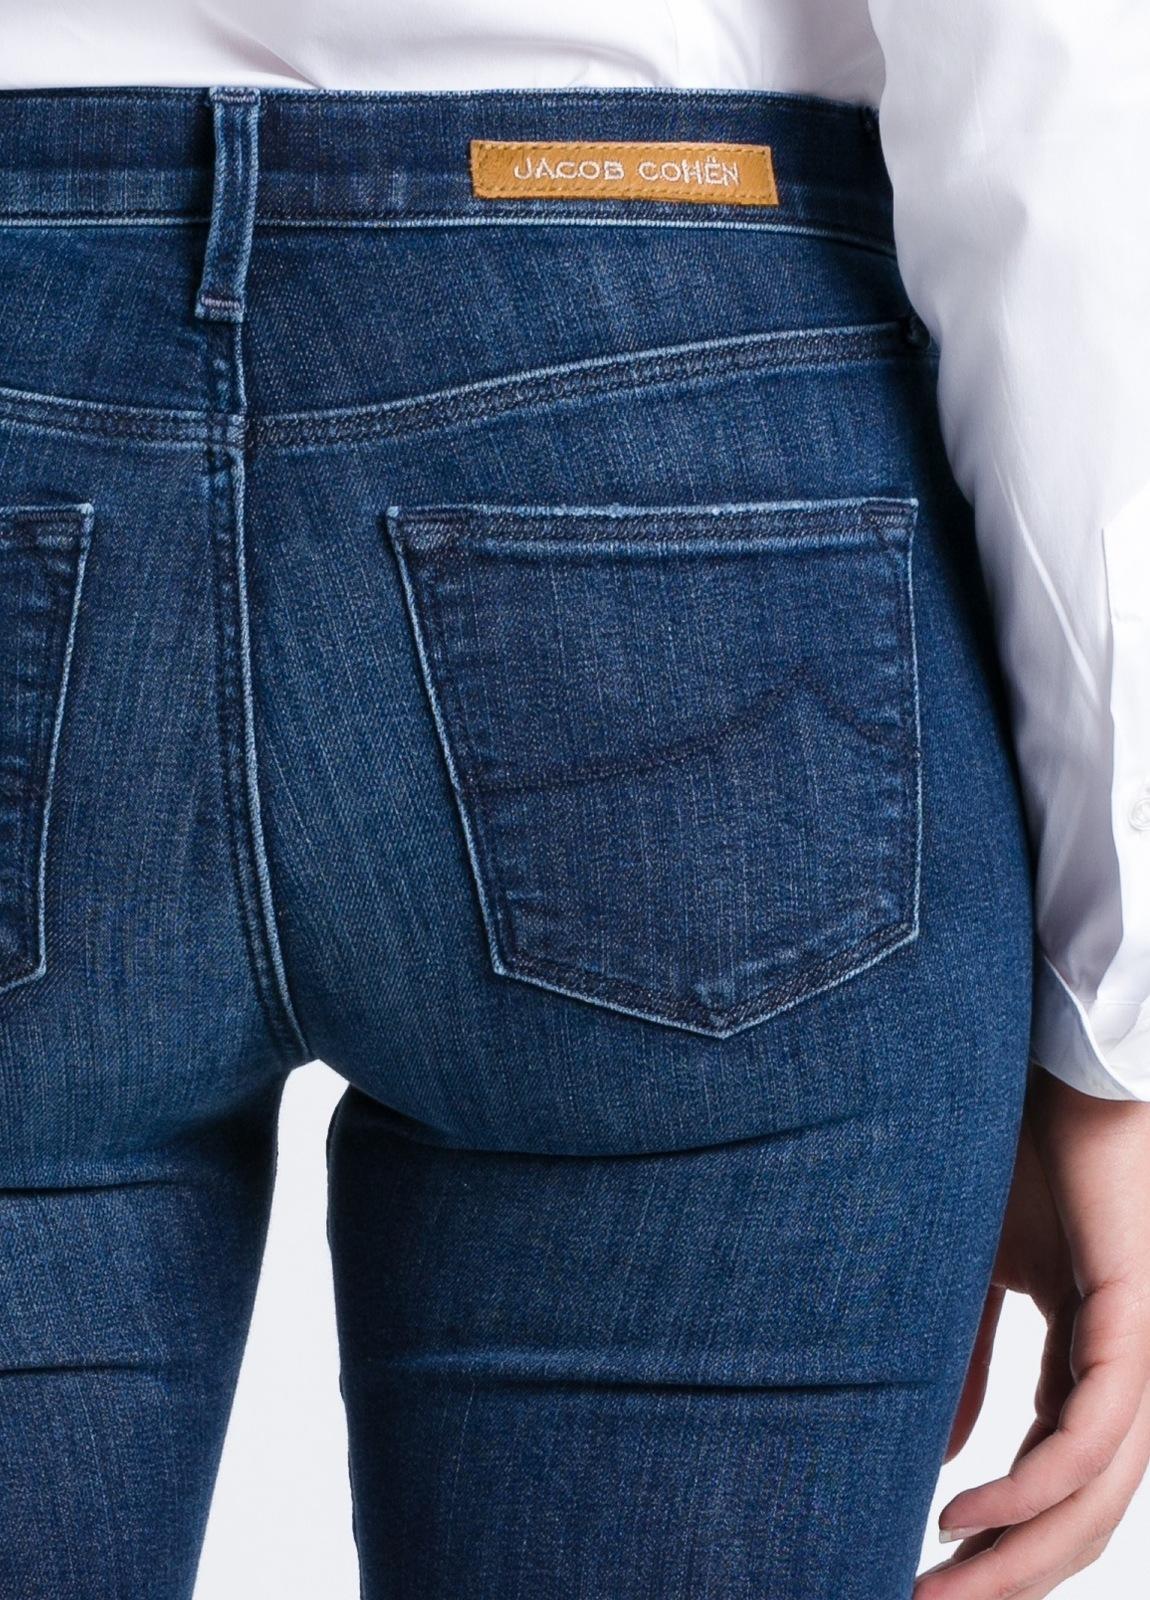 Pantalón tejano woman modelo KIMBERLY SLIM, color azul lavado. - Ítem1